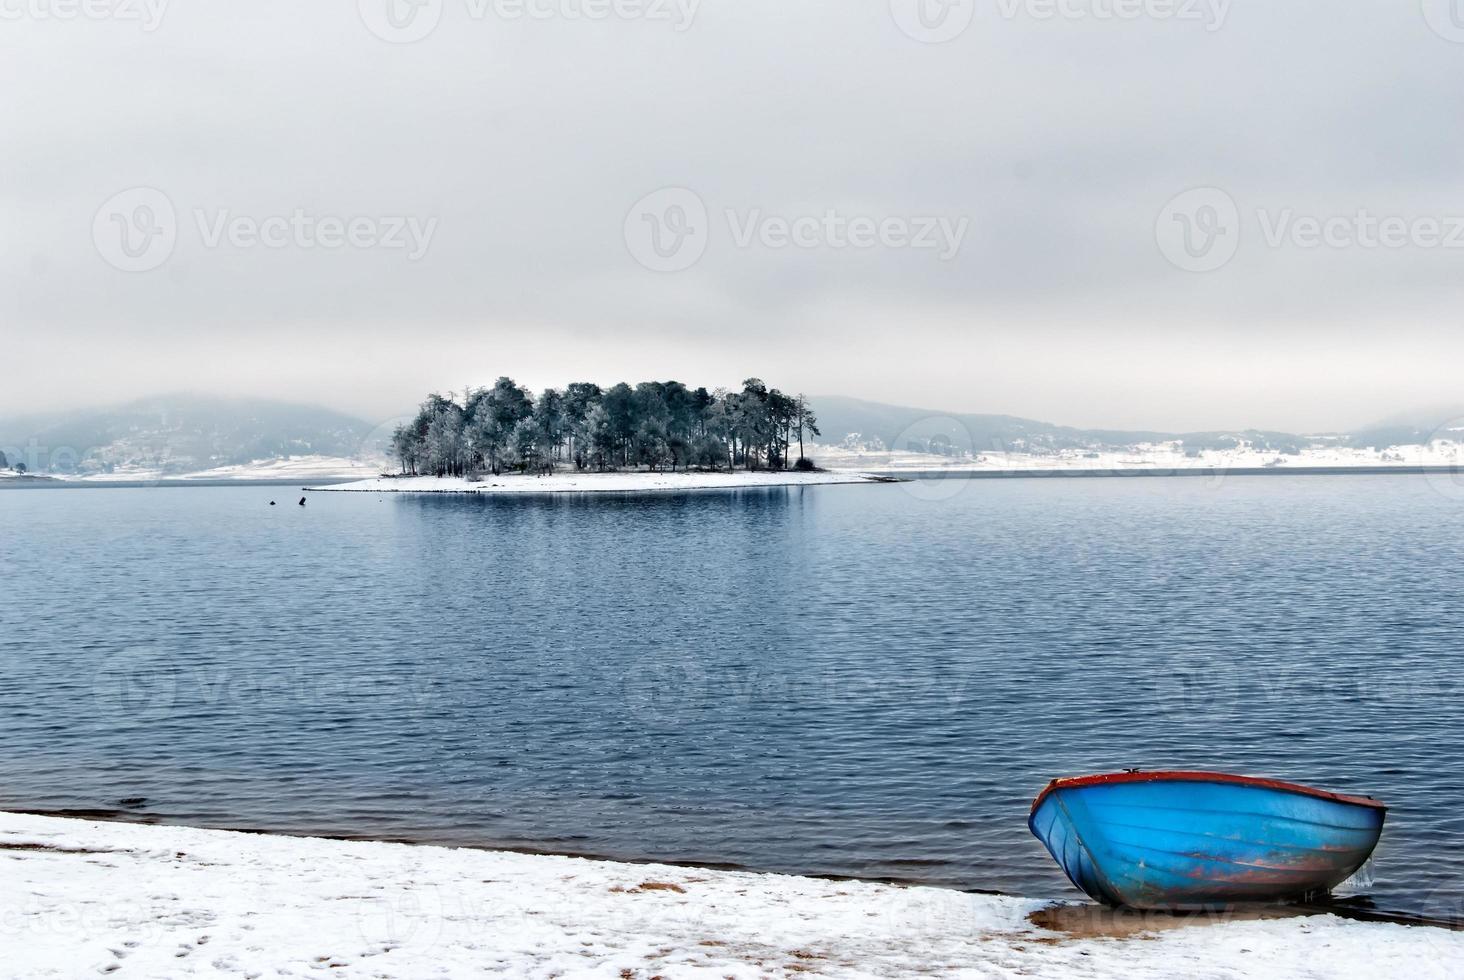 lago da montanha e barco foto